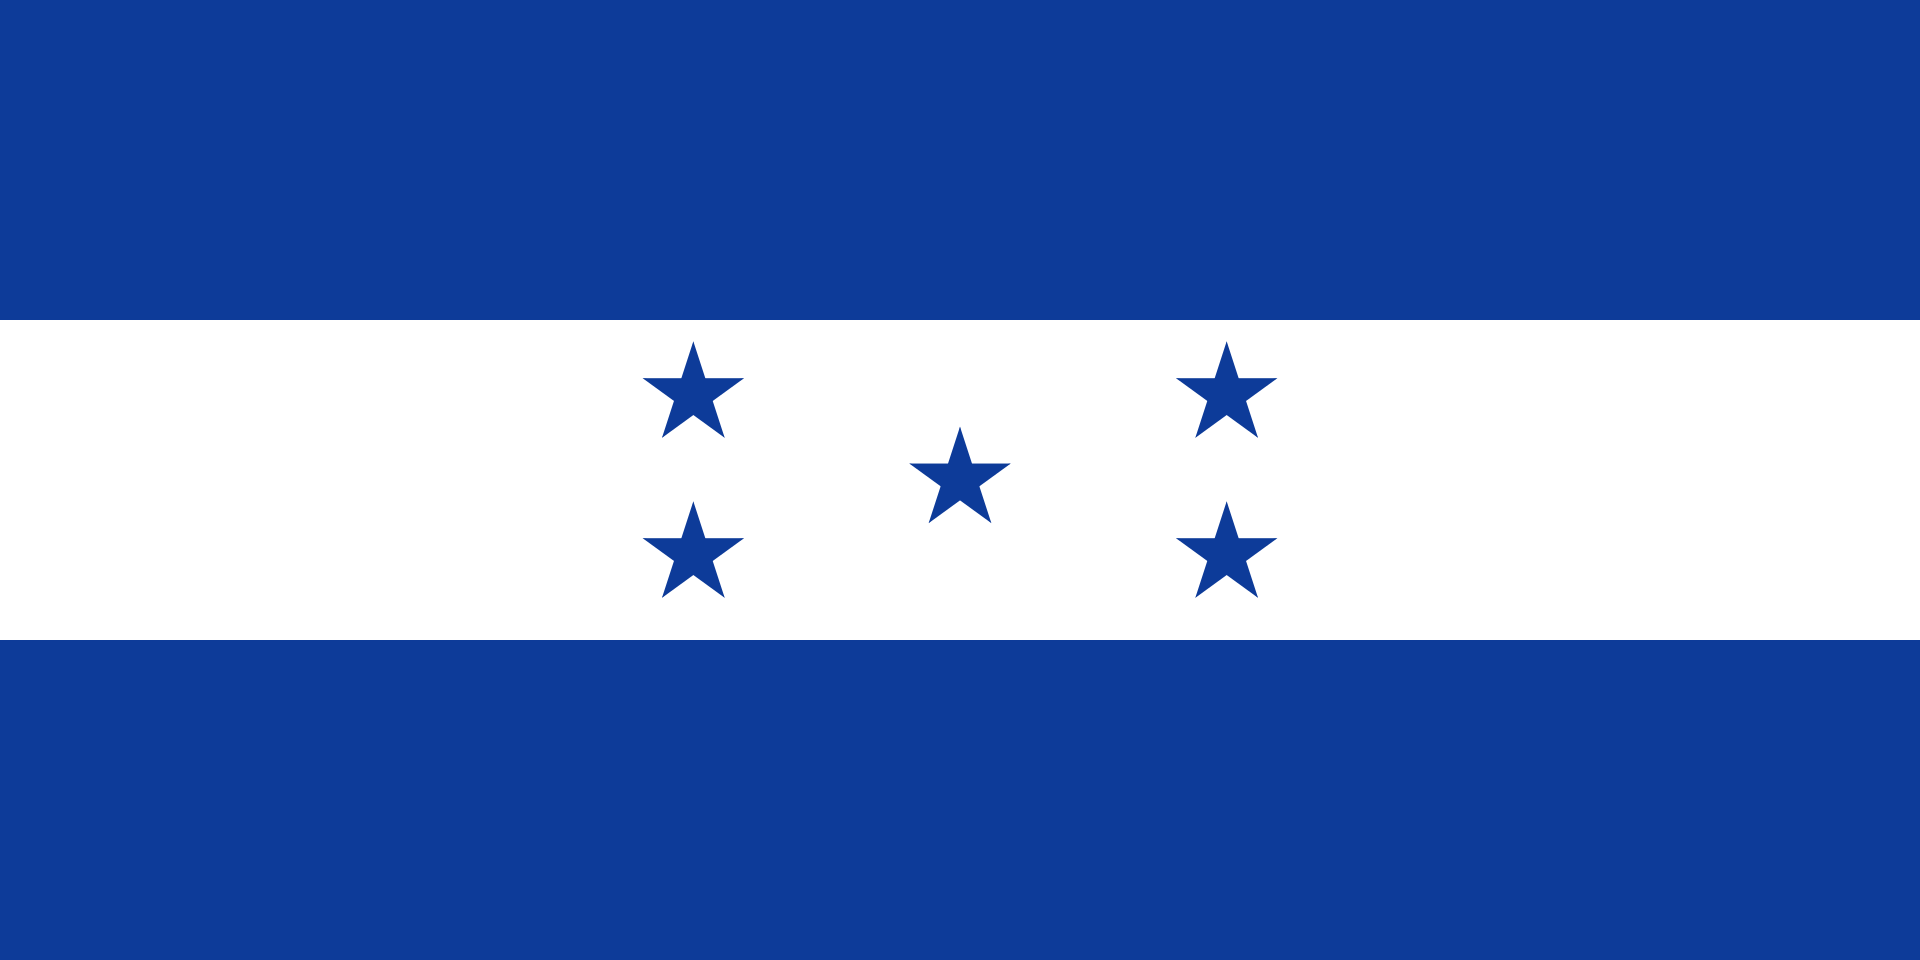 Chemical-Free Honduras Pool Dealer Flag